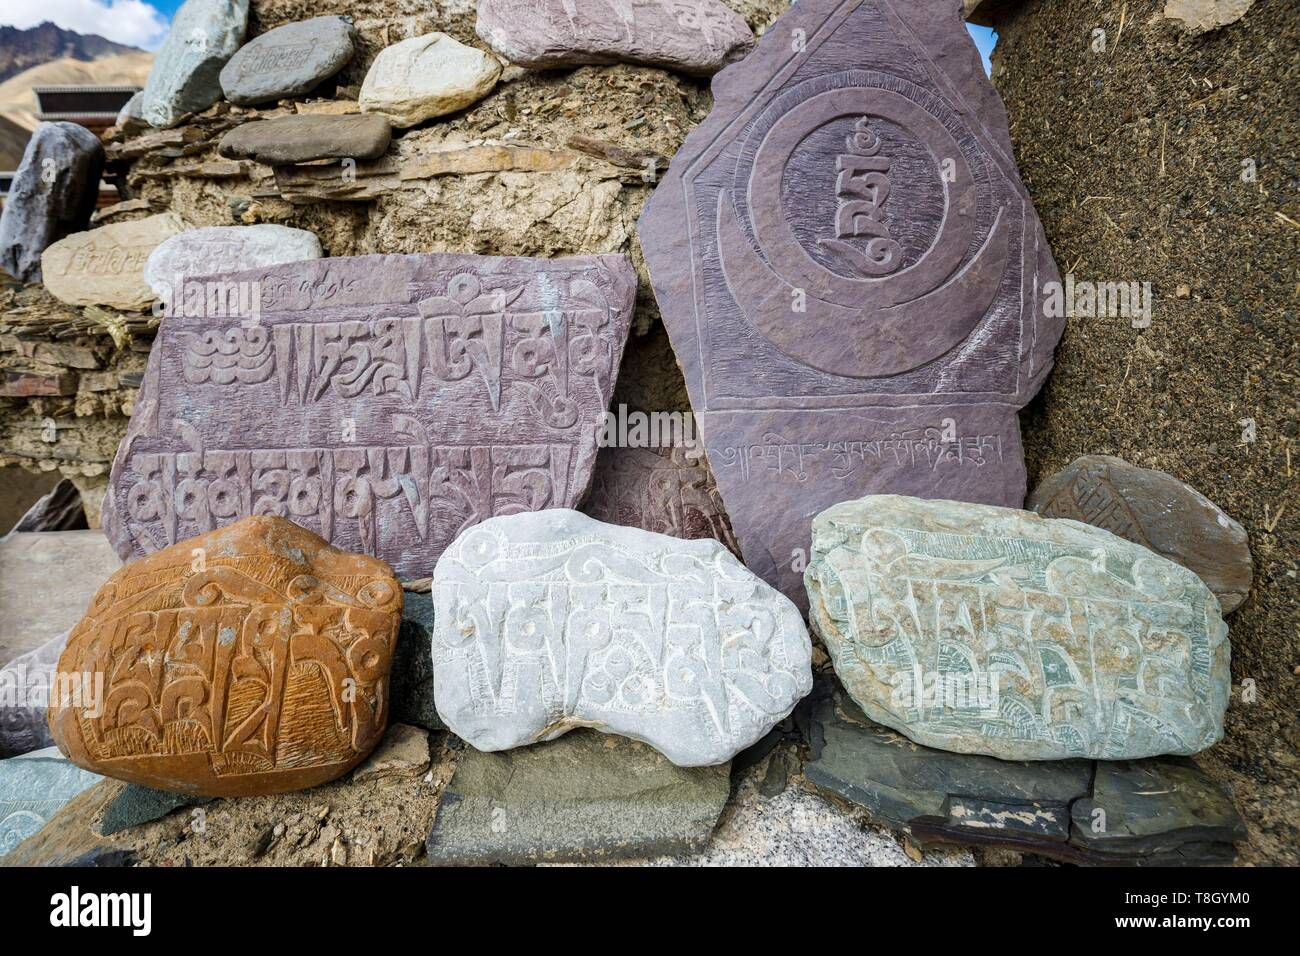 engraved stones stock  engraved stones stock